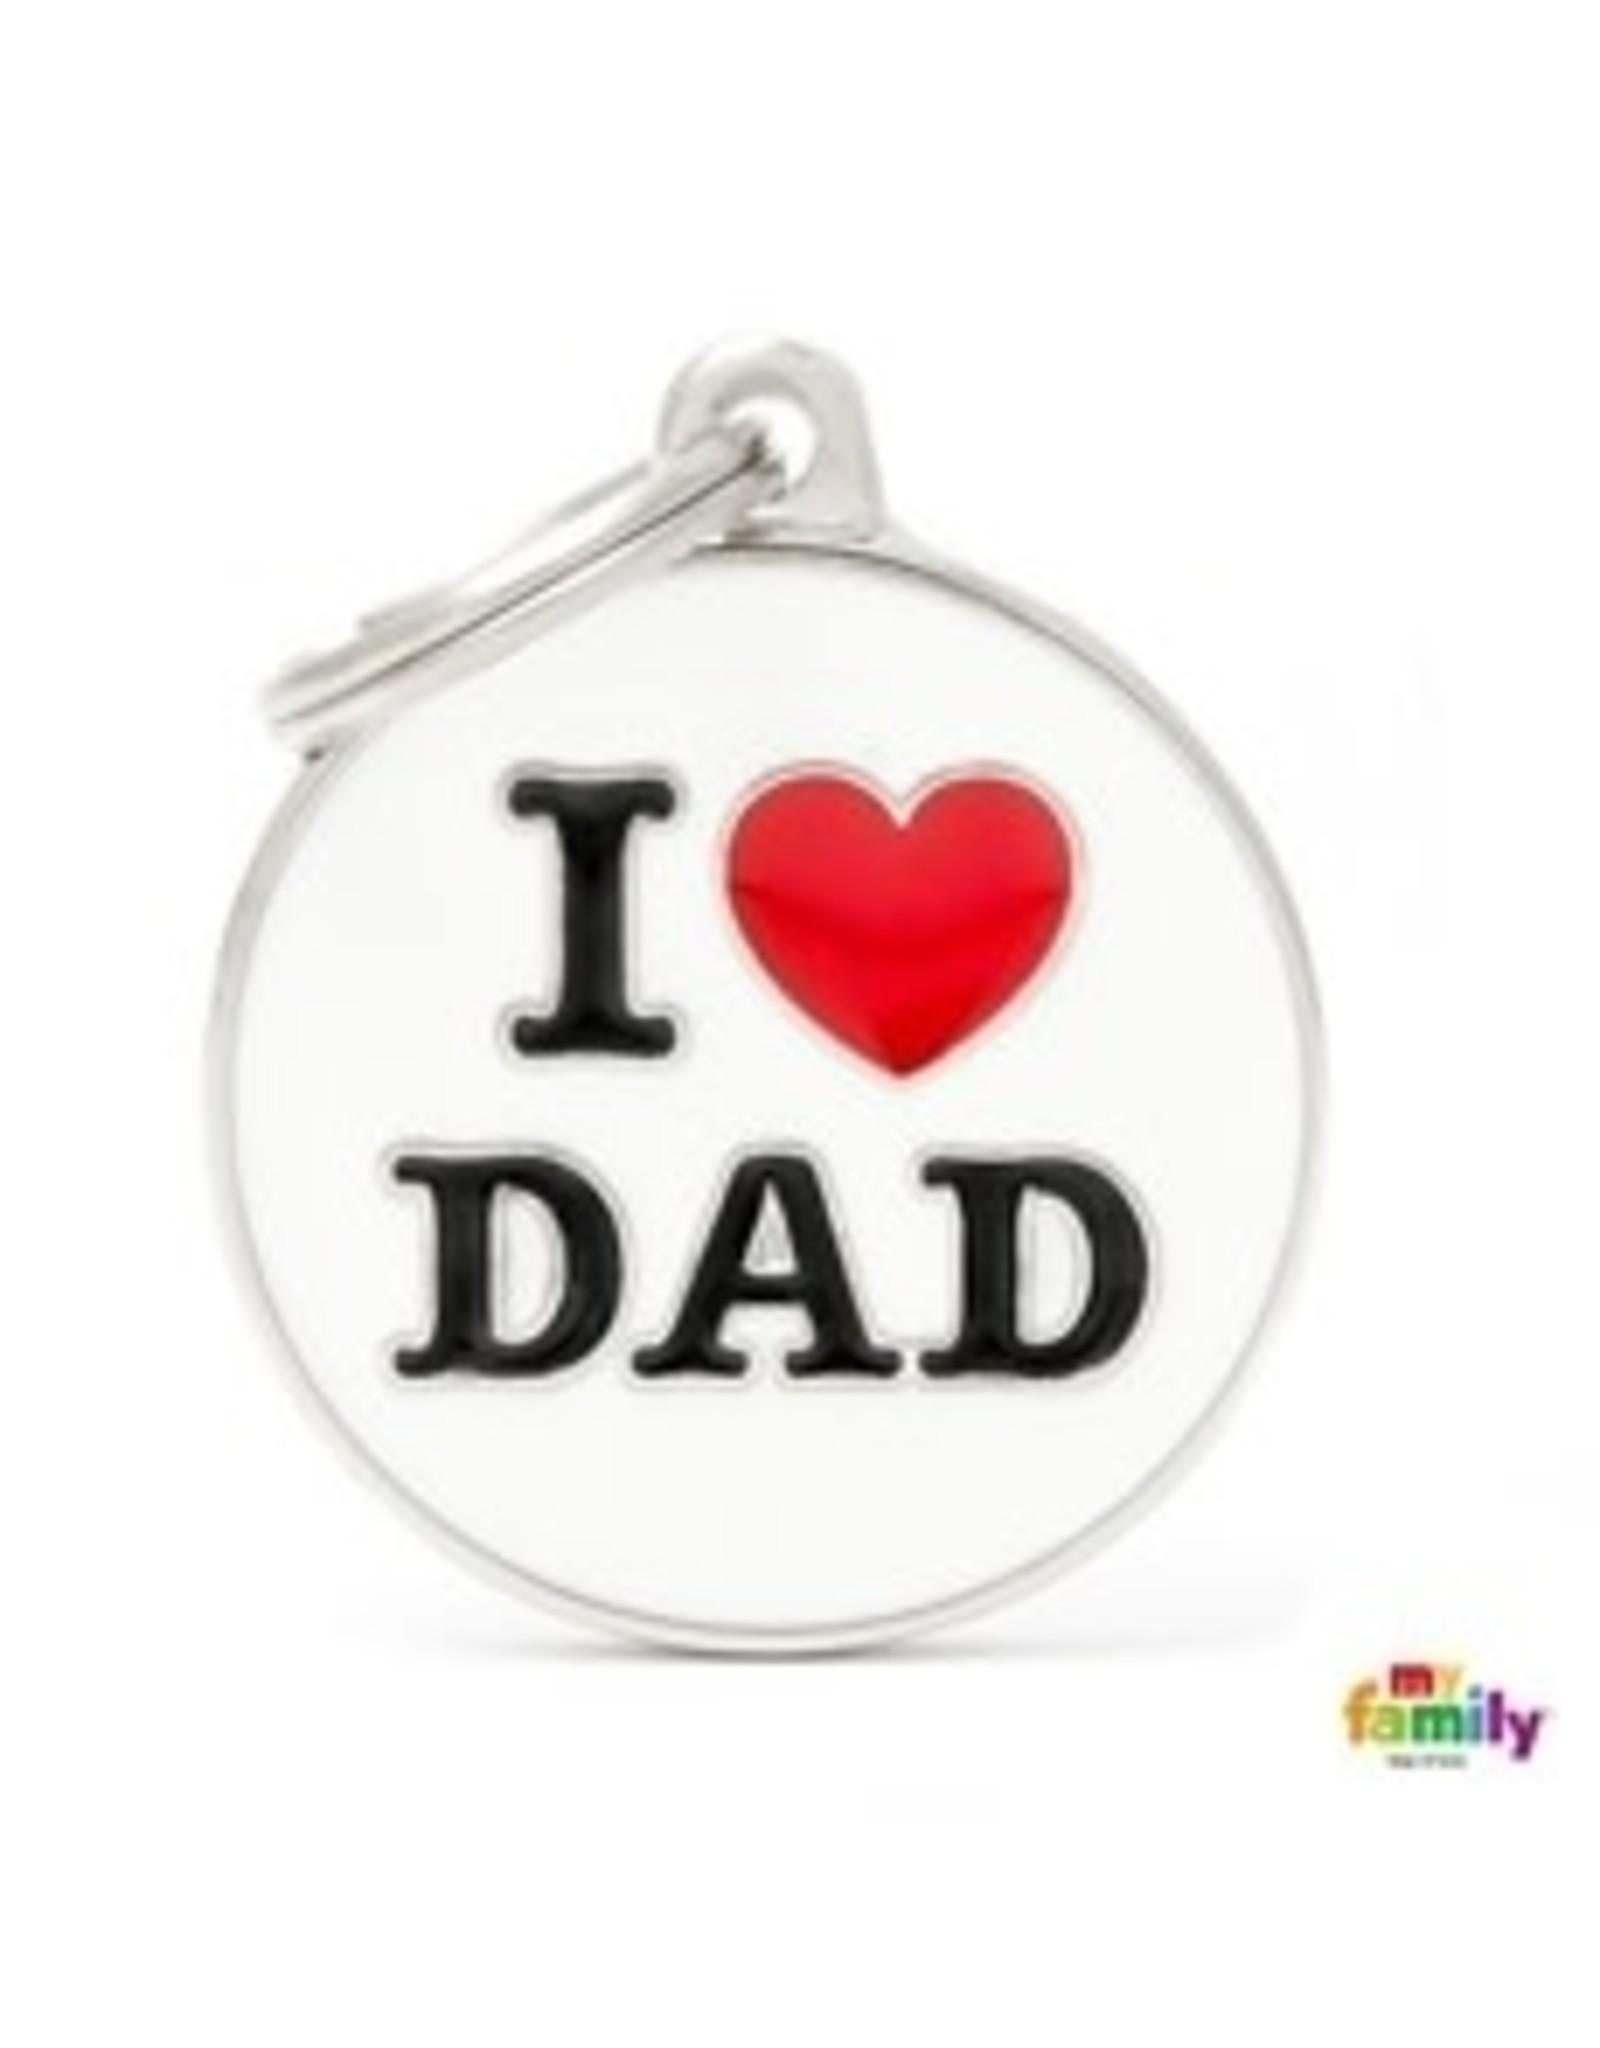 MyFamily Tag - I Love Dad